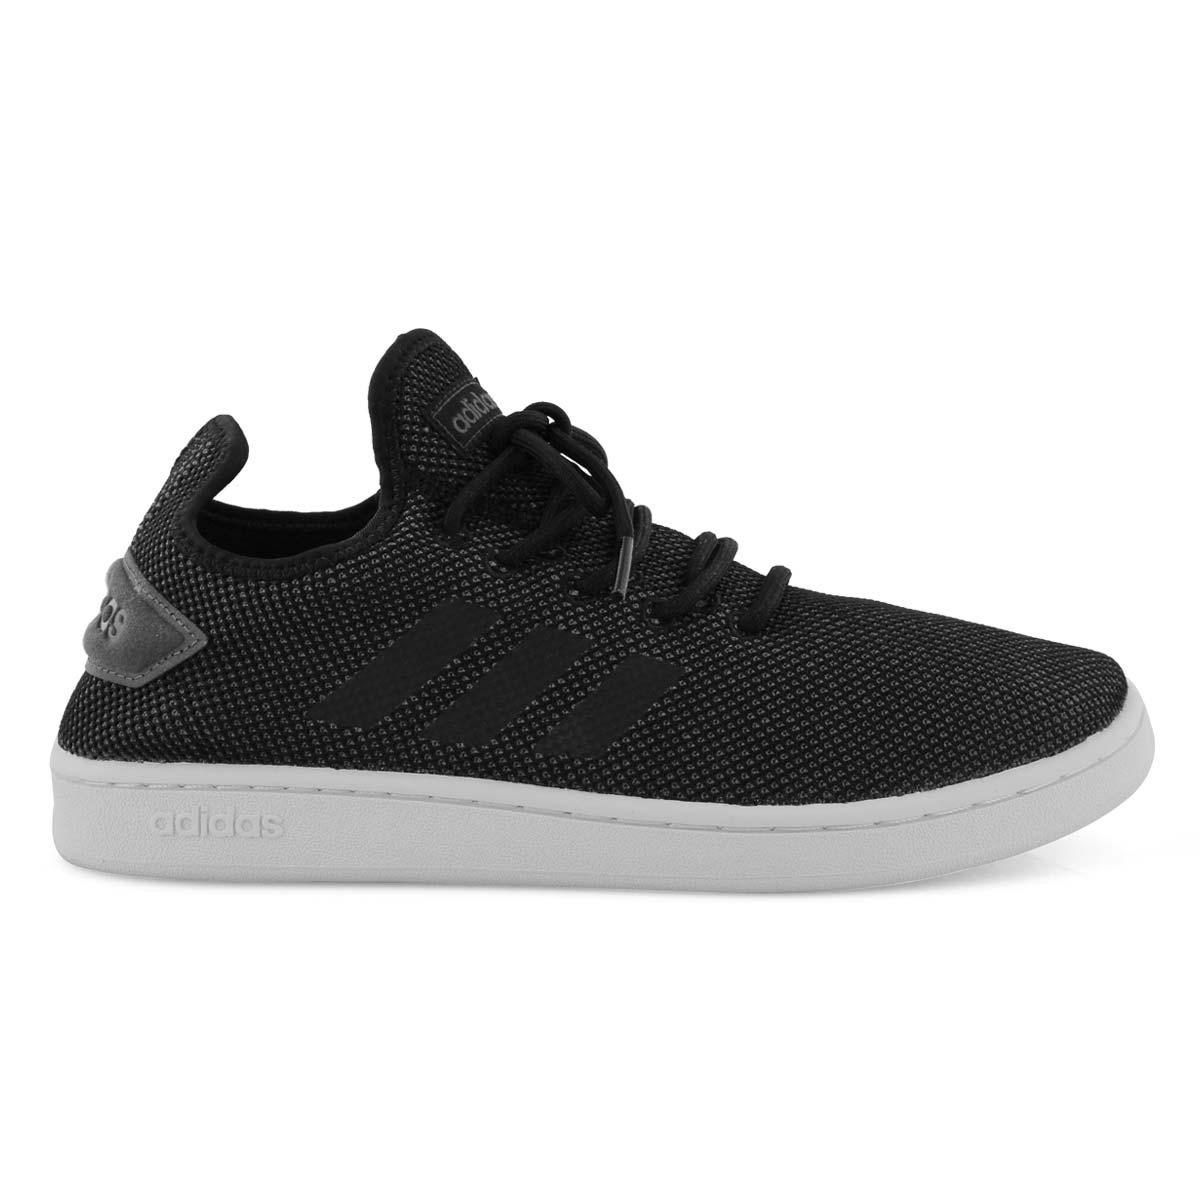 Mns Court Adapt blk/blk running shoe